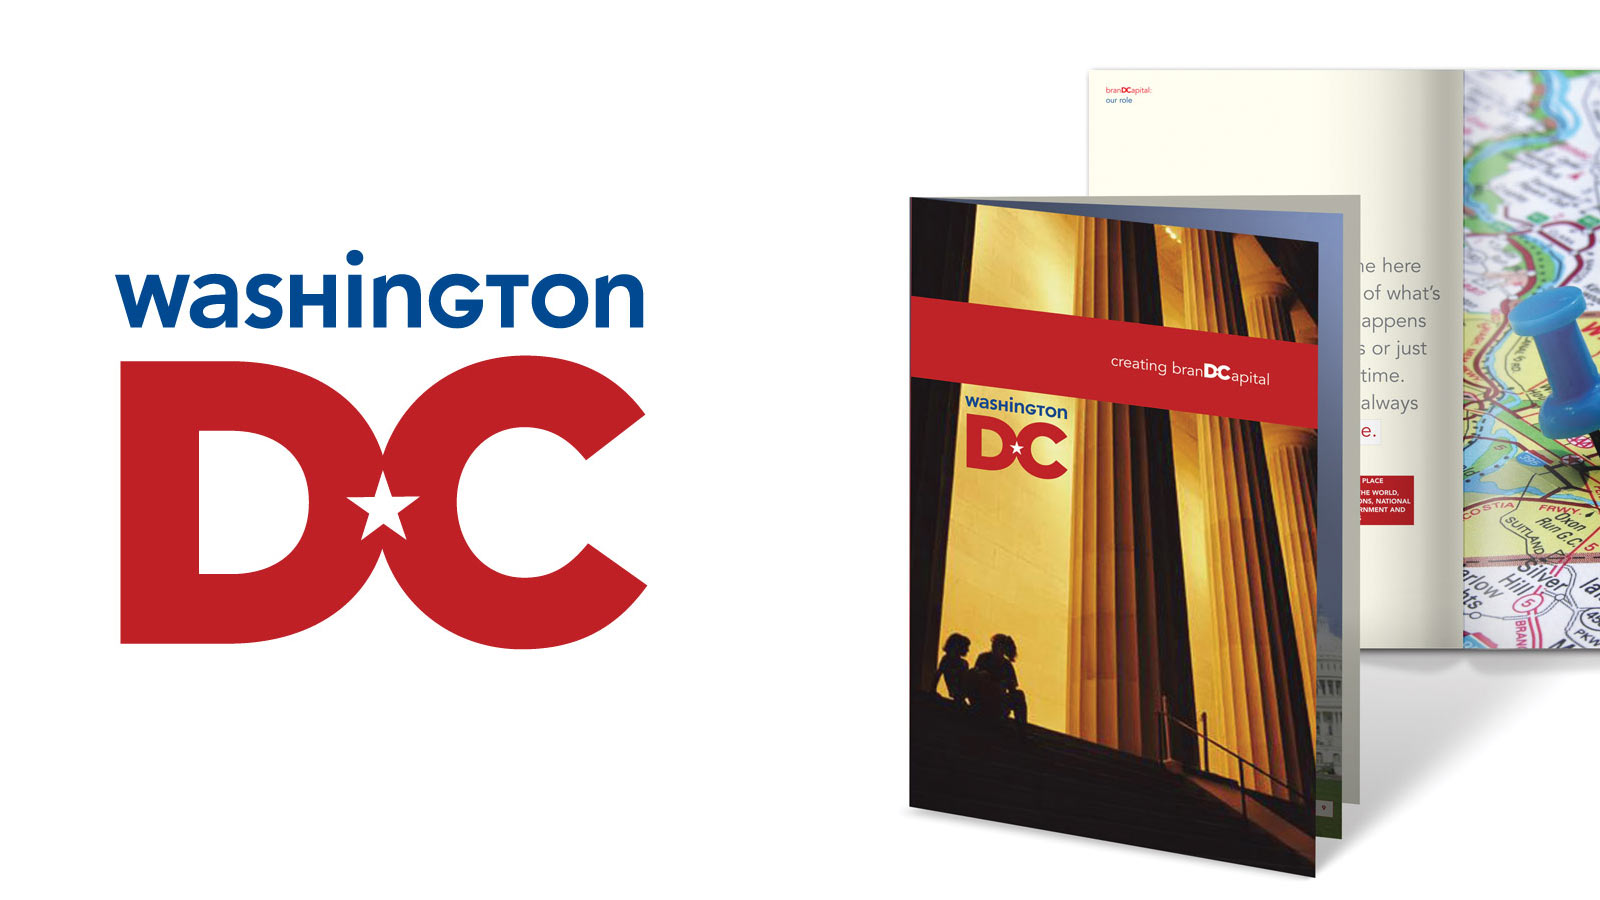 Washington, D.C. | Washington, DC Place Branding | Advertising, Brand Strategy, Design, Place Branding, Strategy